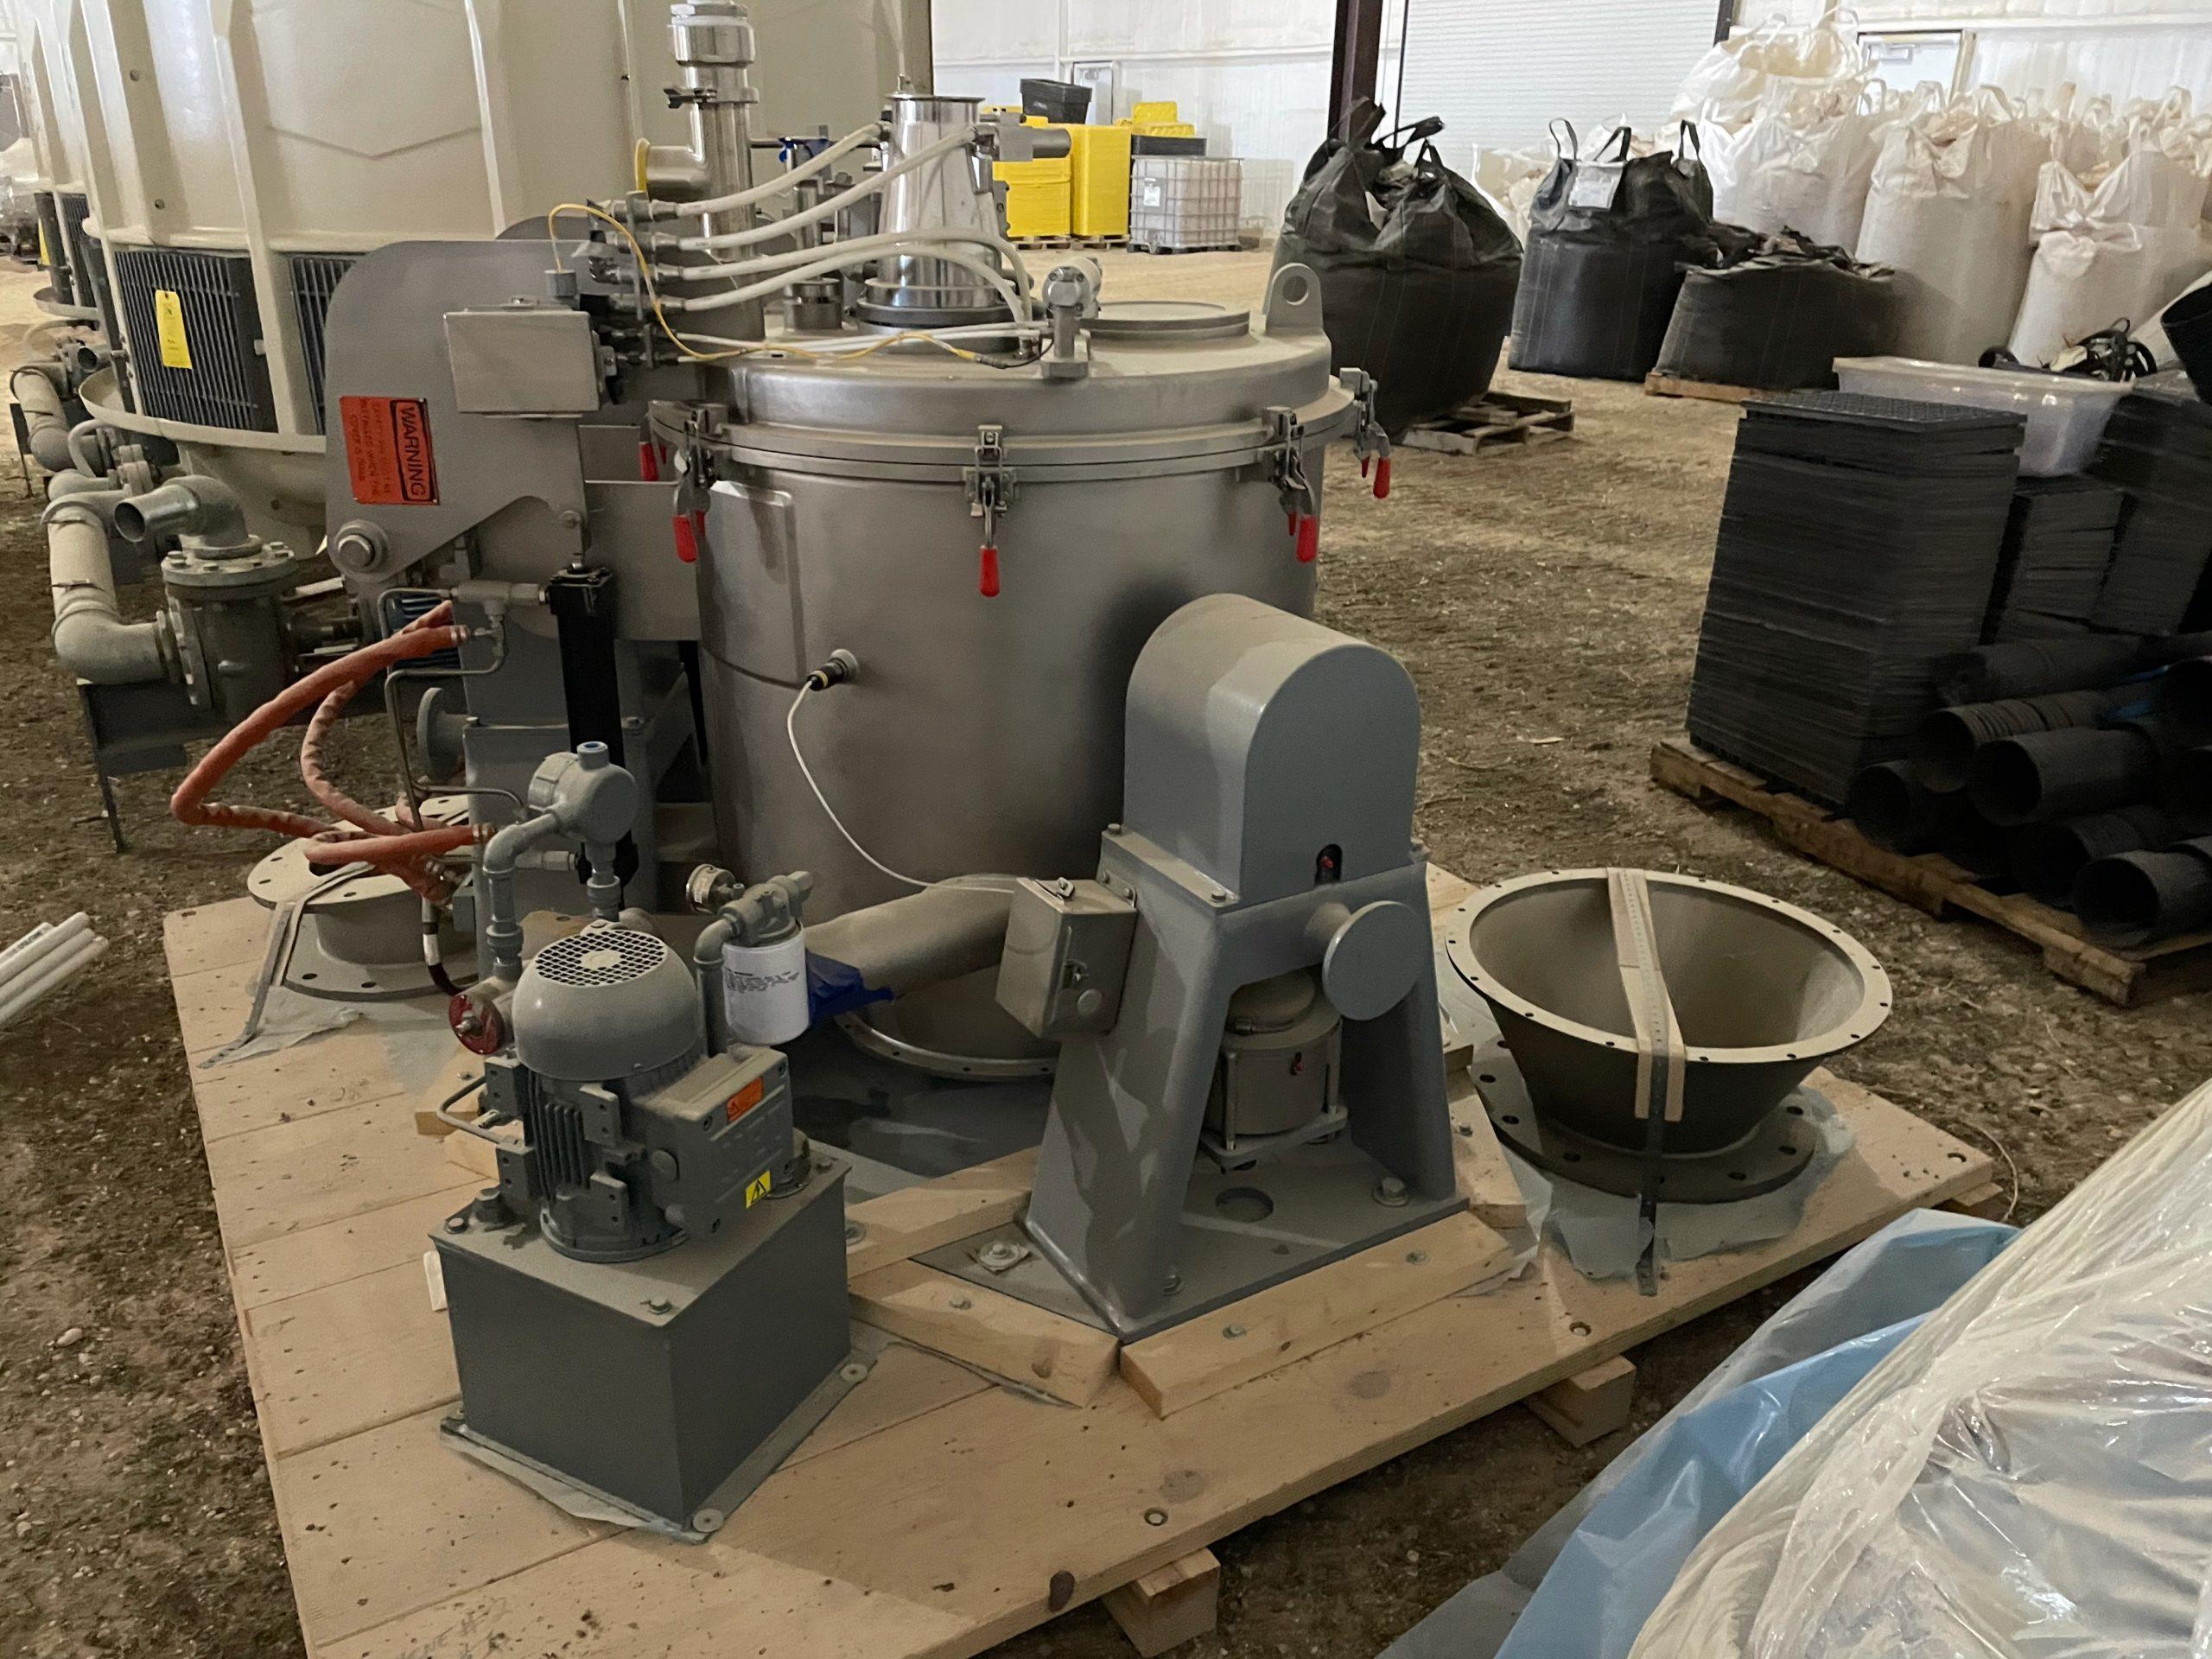 Western States Q-120 perforate basket centrifuges